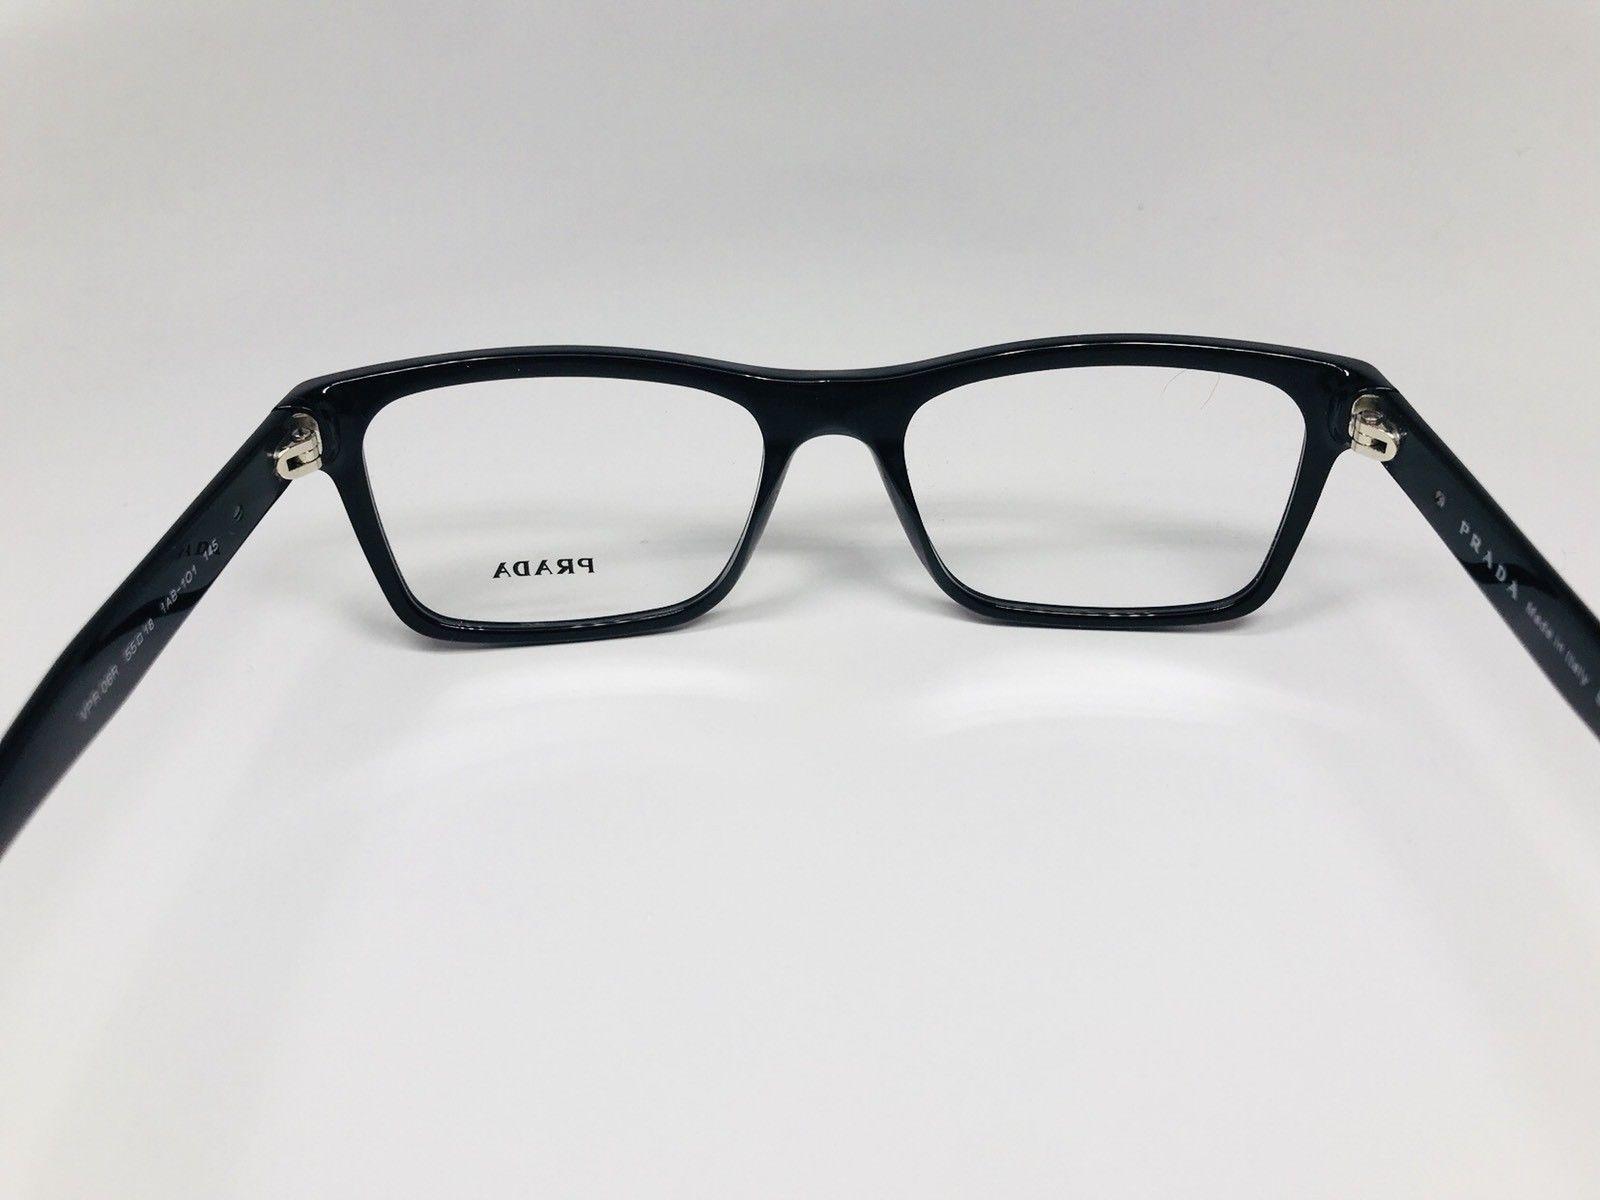 New Authentic PRADA VPR 06R 1AB-1O1 Shiny Black Eyeglasses 55/18/145 with Case